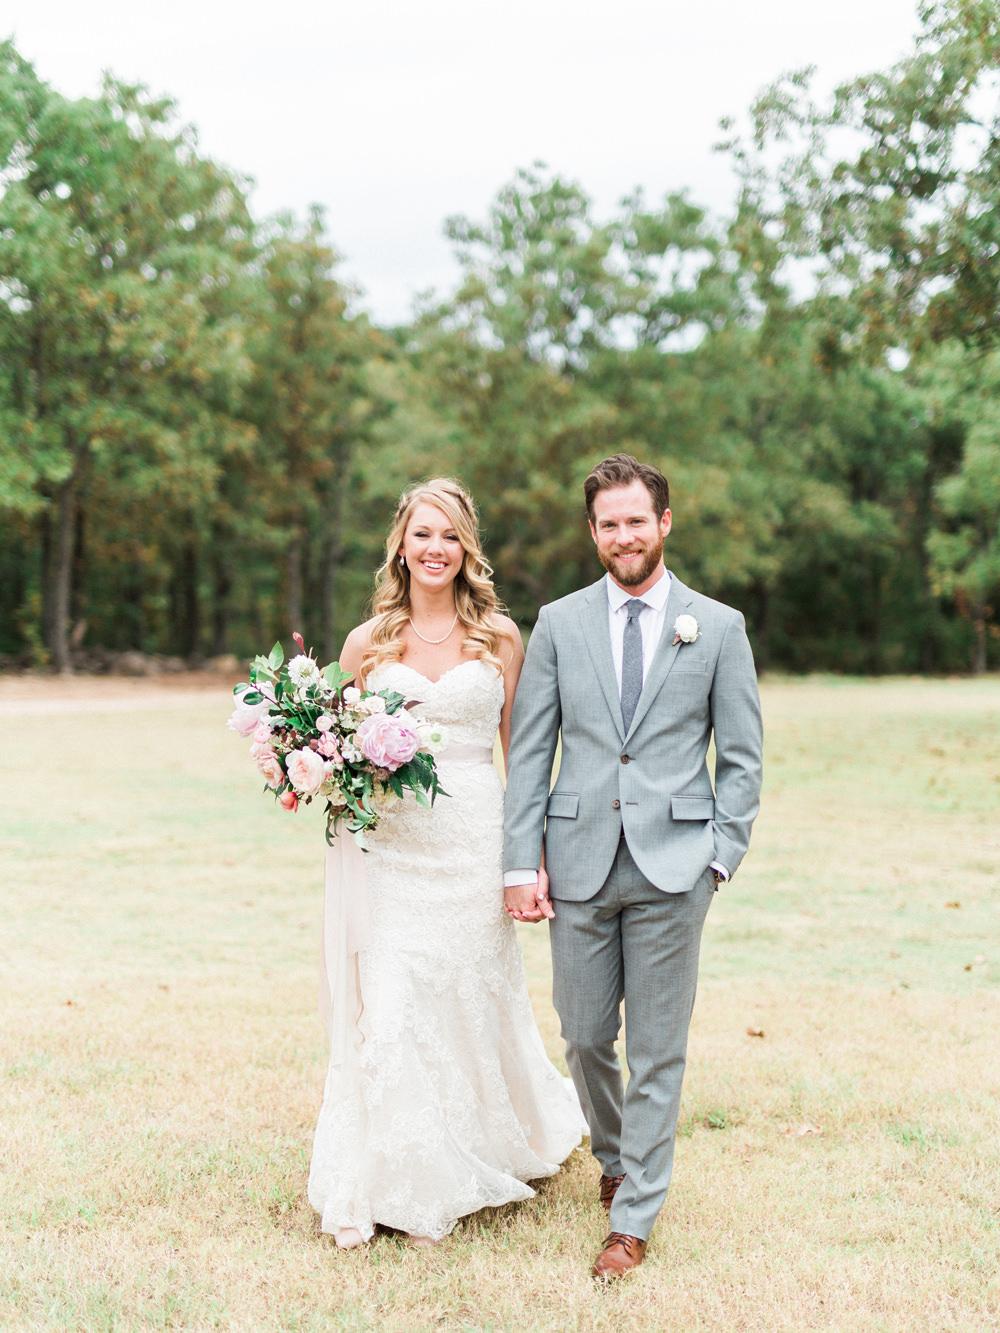 wedding portraits - photo by Elisabeth Carol Photography http://ruffledblog.com/picturesque-garden-wedding-at-white-sparrow-barn